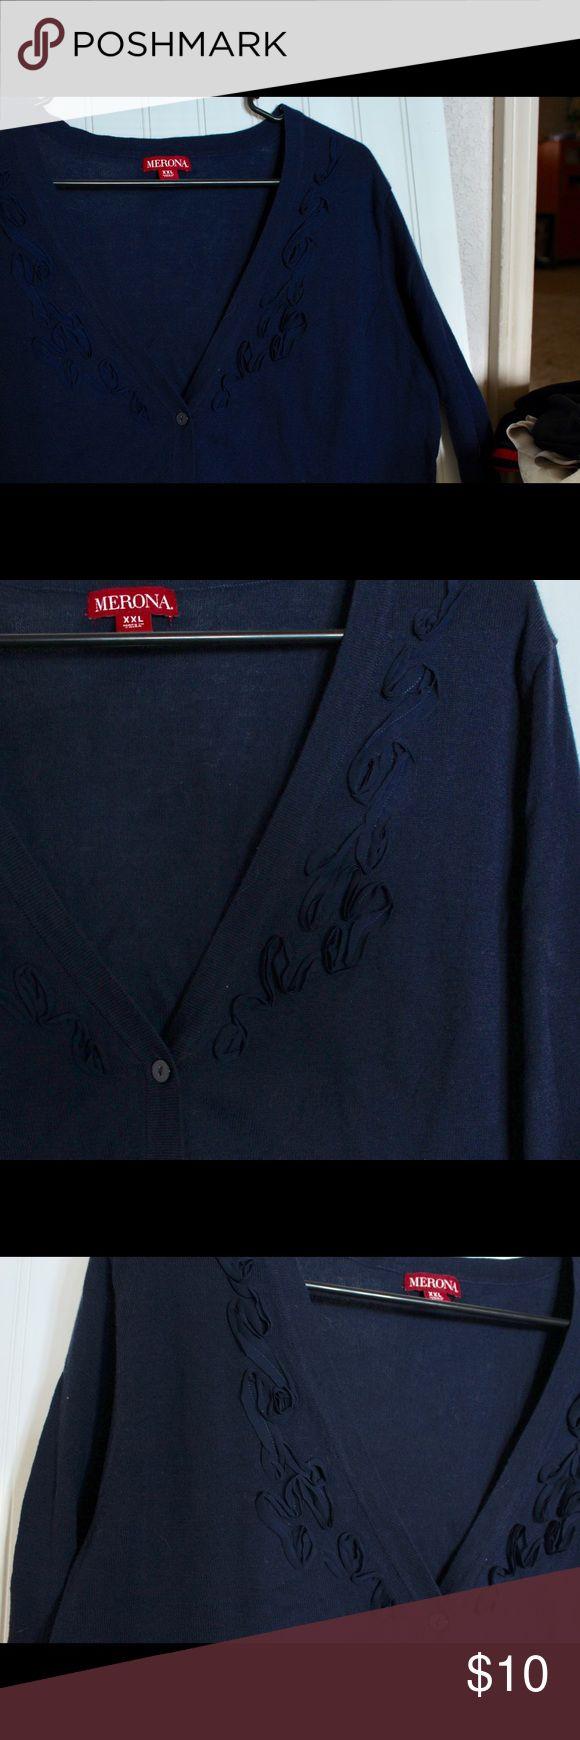 Navy blue cardigan w/ floral detail Navy blue cardigan w/ long sleeves and floral detail around neckline Merona Sweaters Cardigans